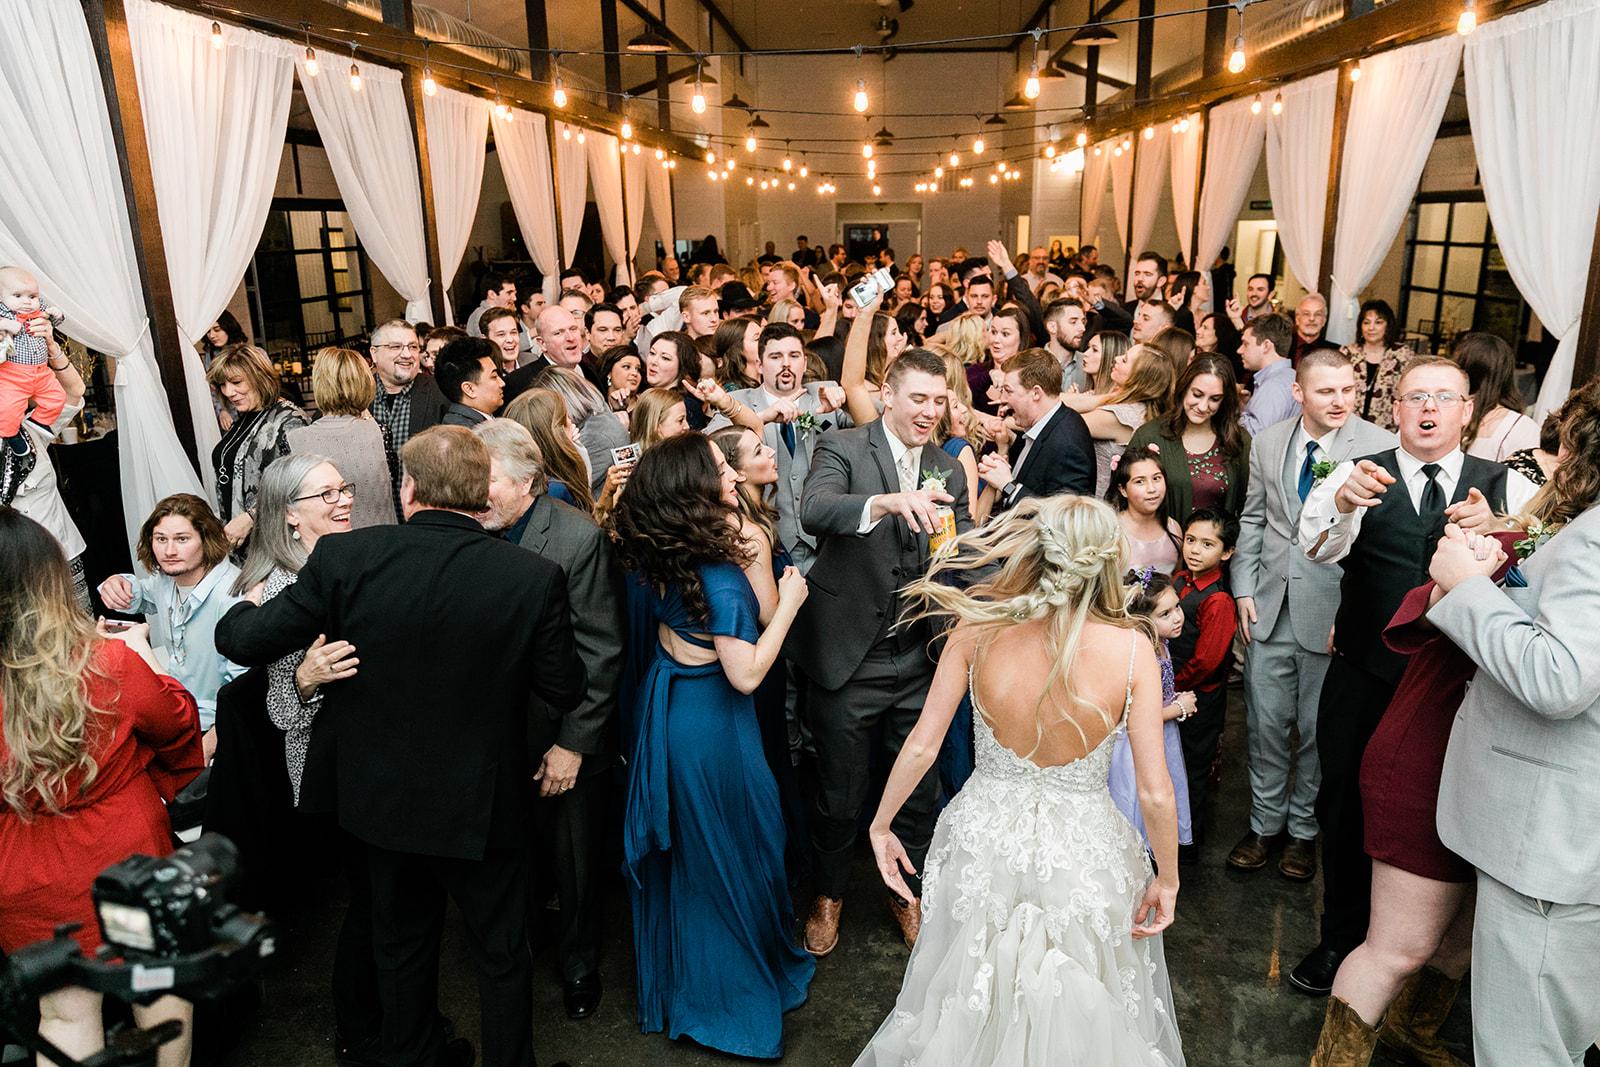 Bixby Tulsa Wedding Venues 42a.jpg